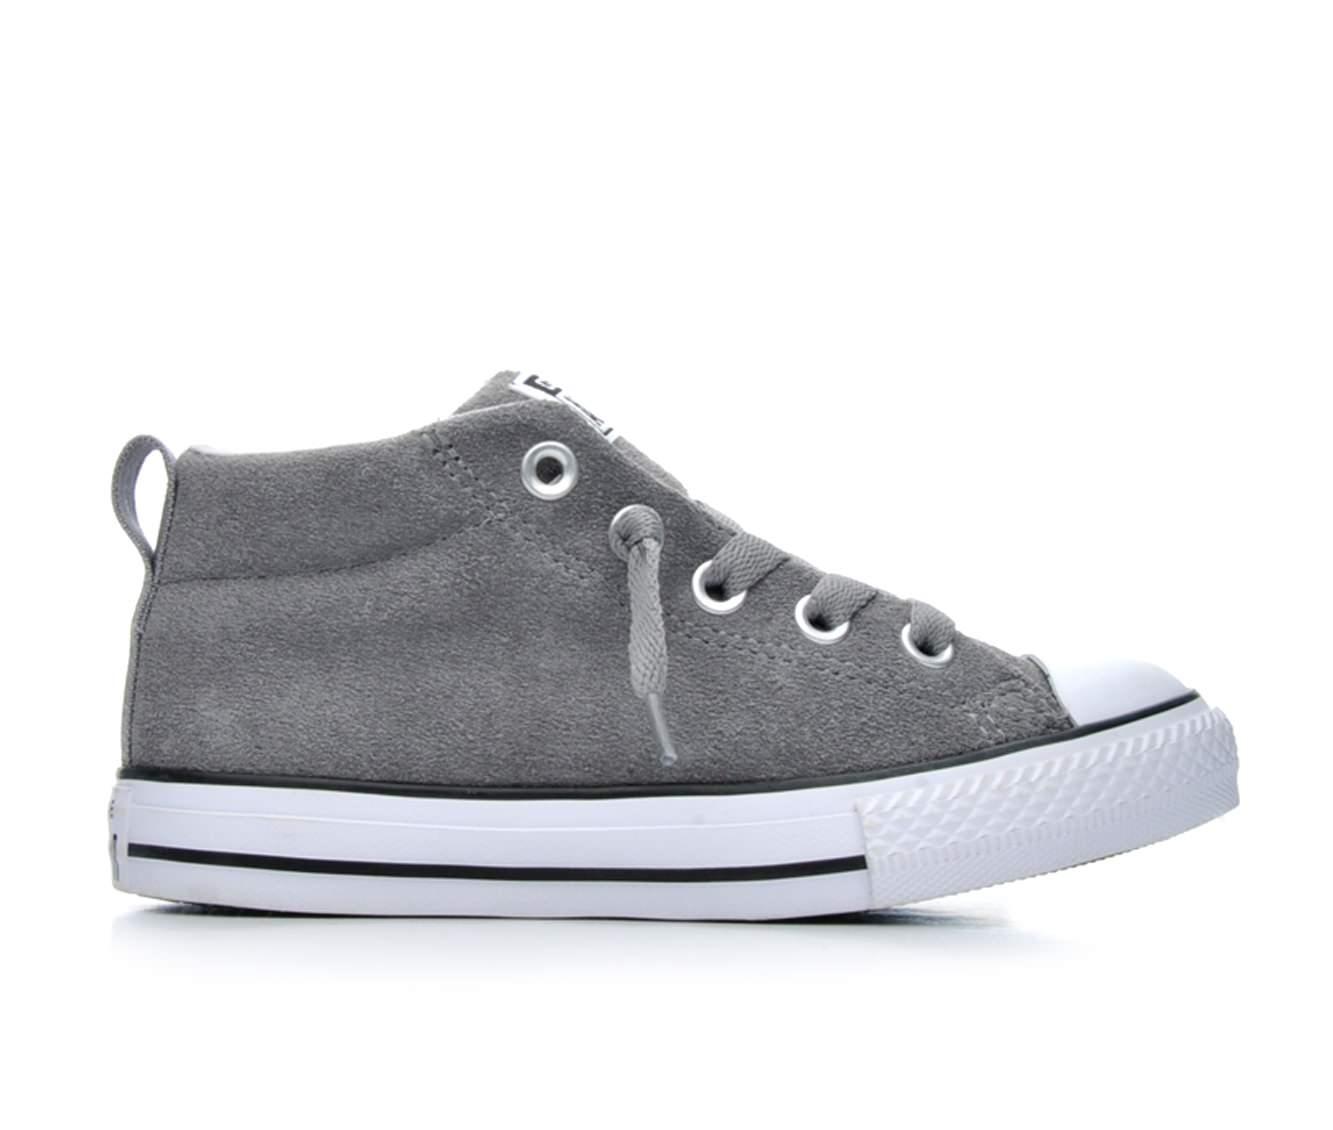 Boys' Converse Chuck Taylor All Star Street Mid Oxford Shoes (Grey)